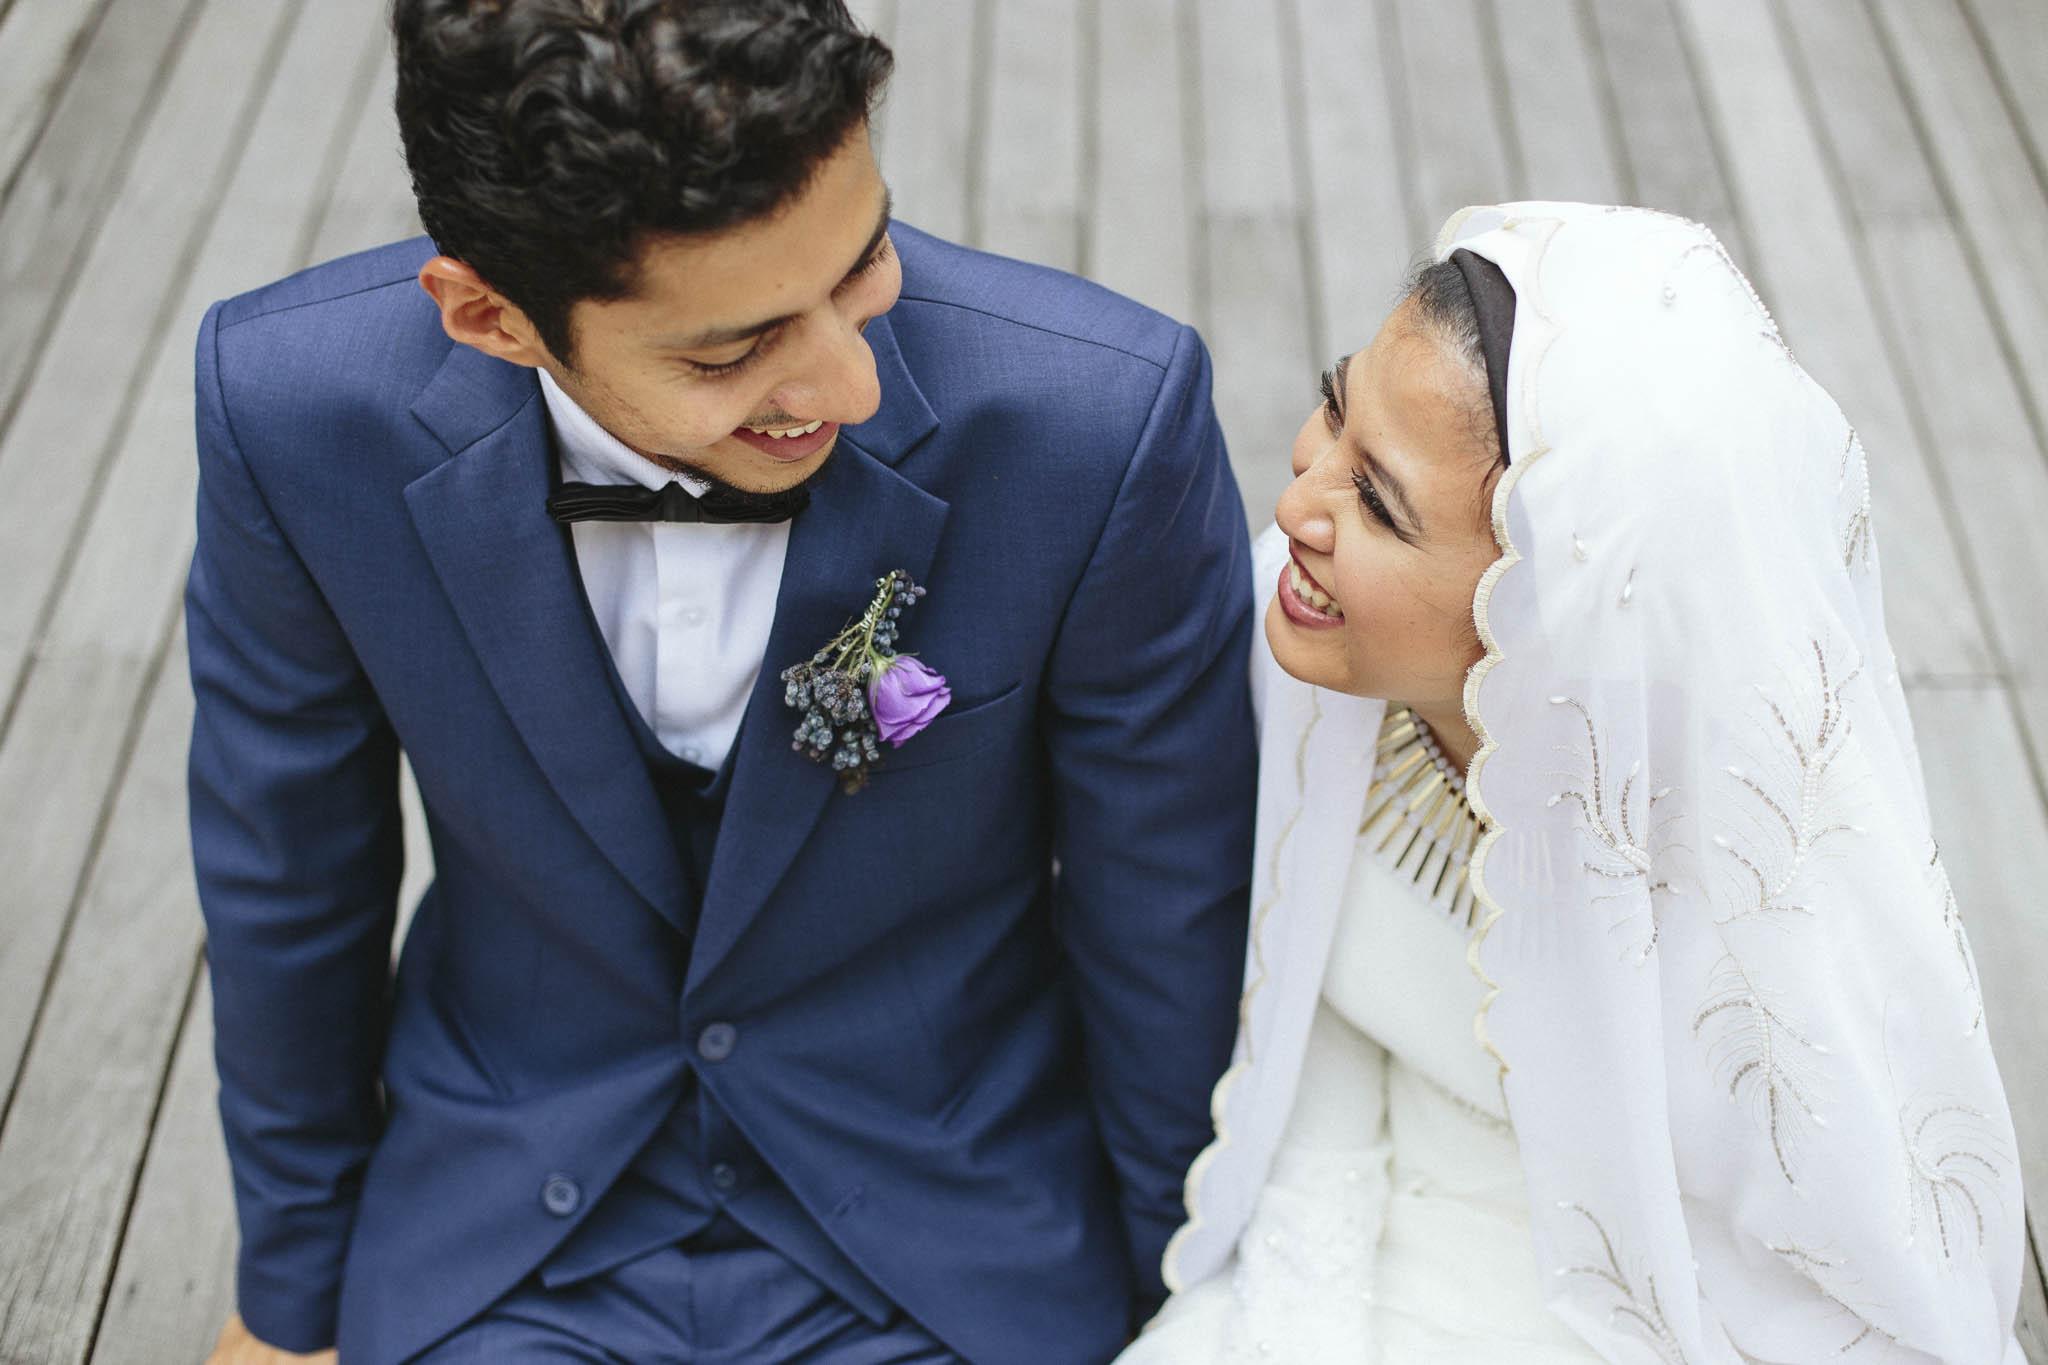 singapore-wedding-photographer-malay-indian-pre-wedding-travel-wmt-2015-51.jpg